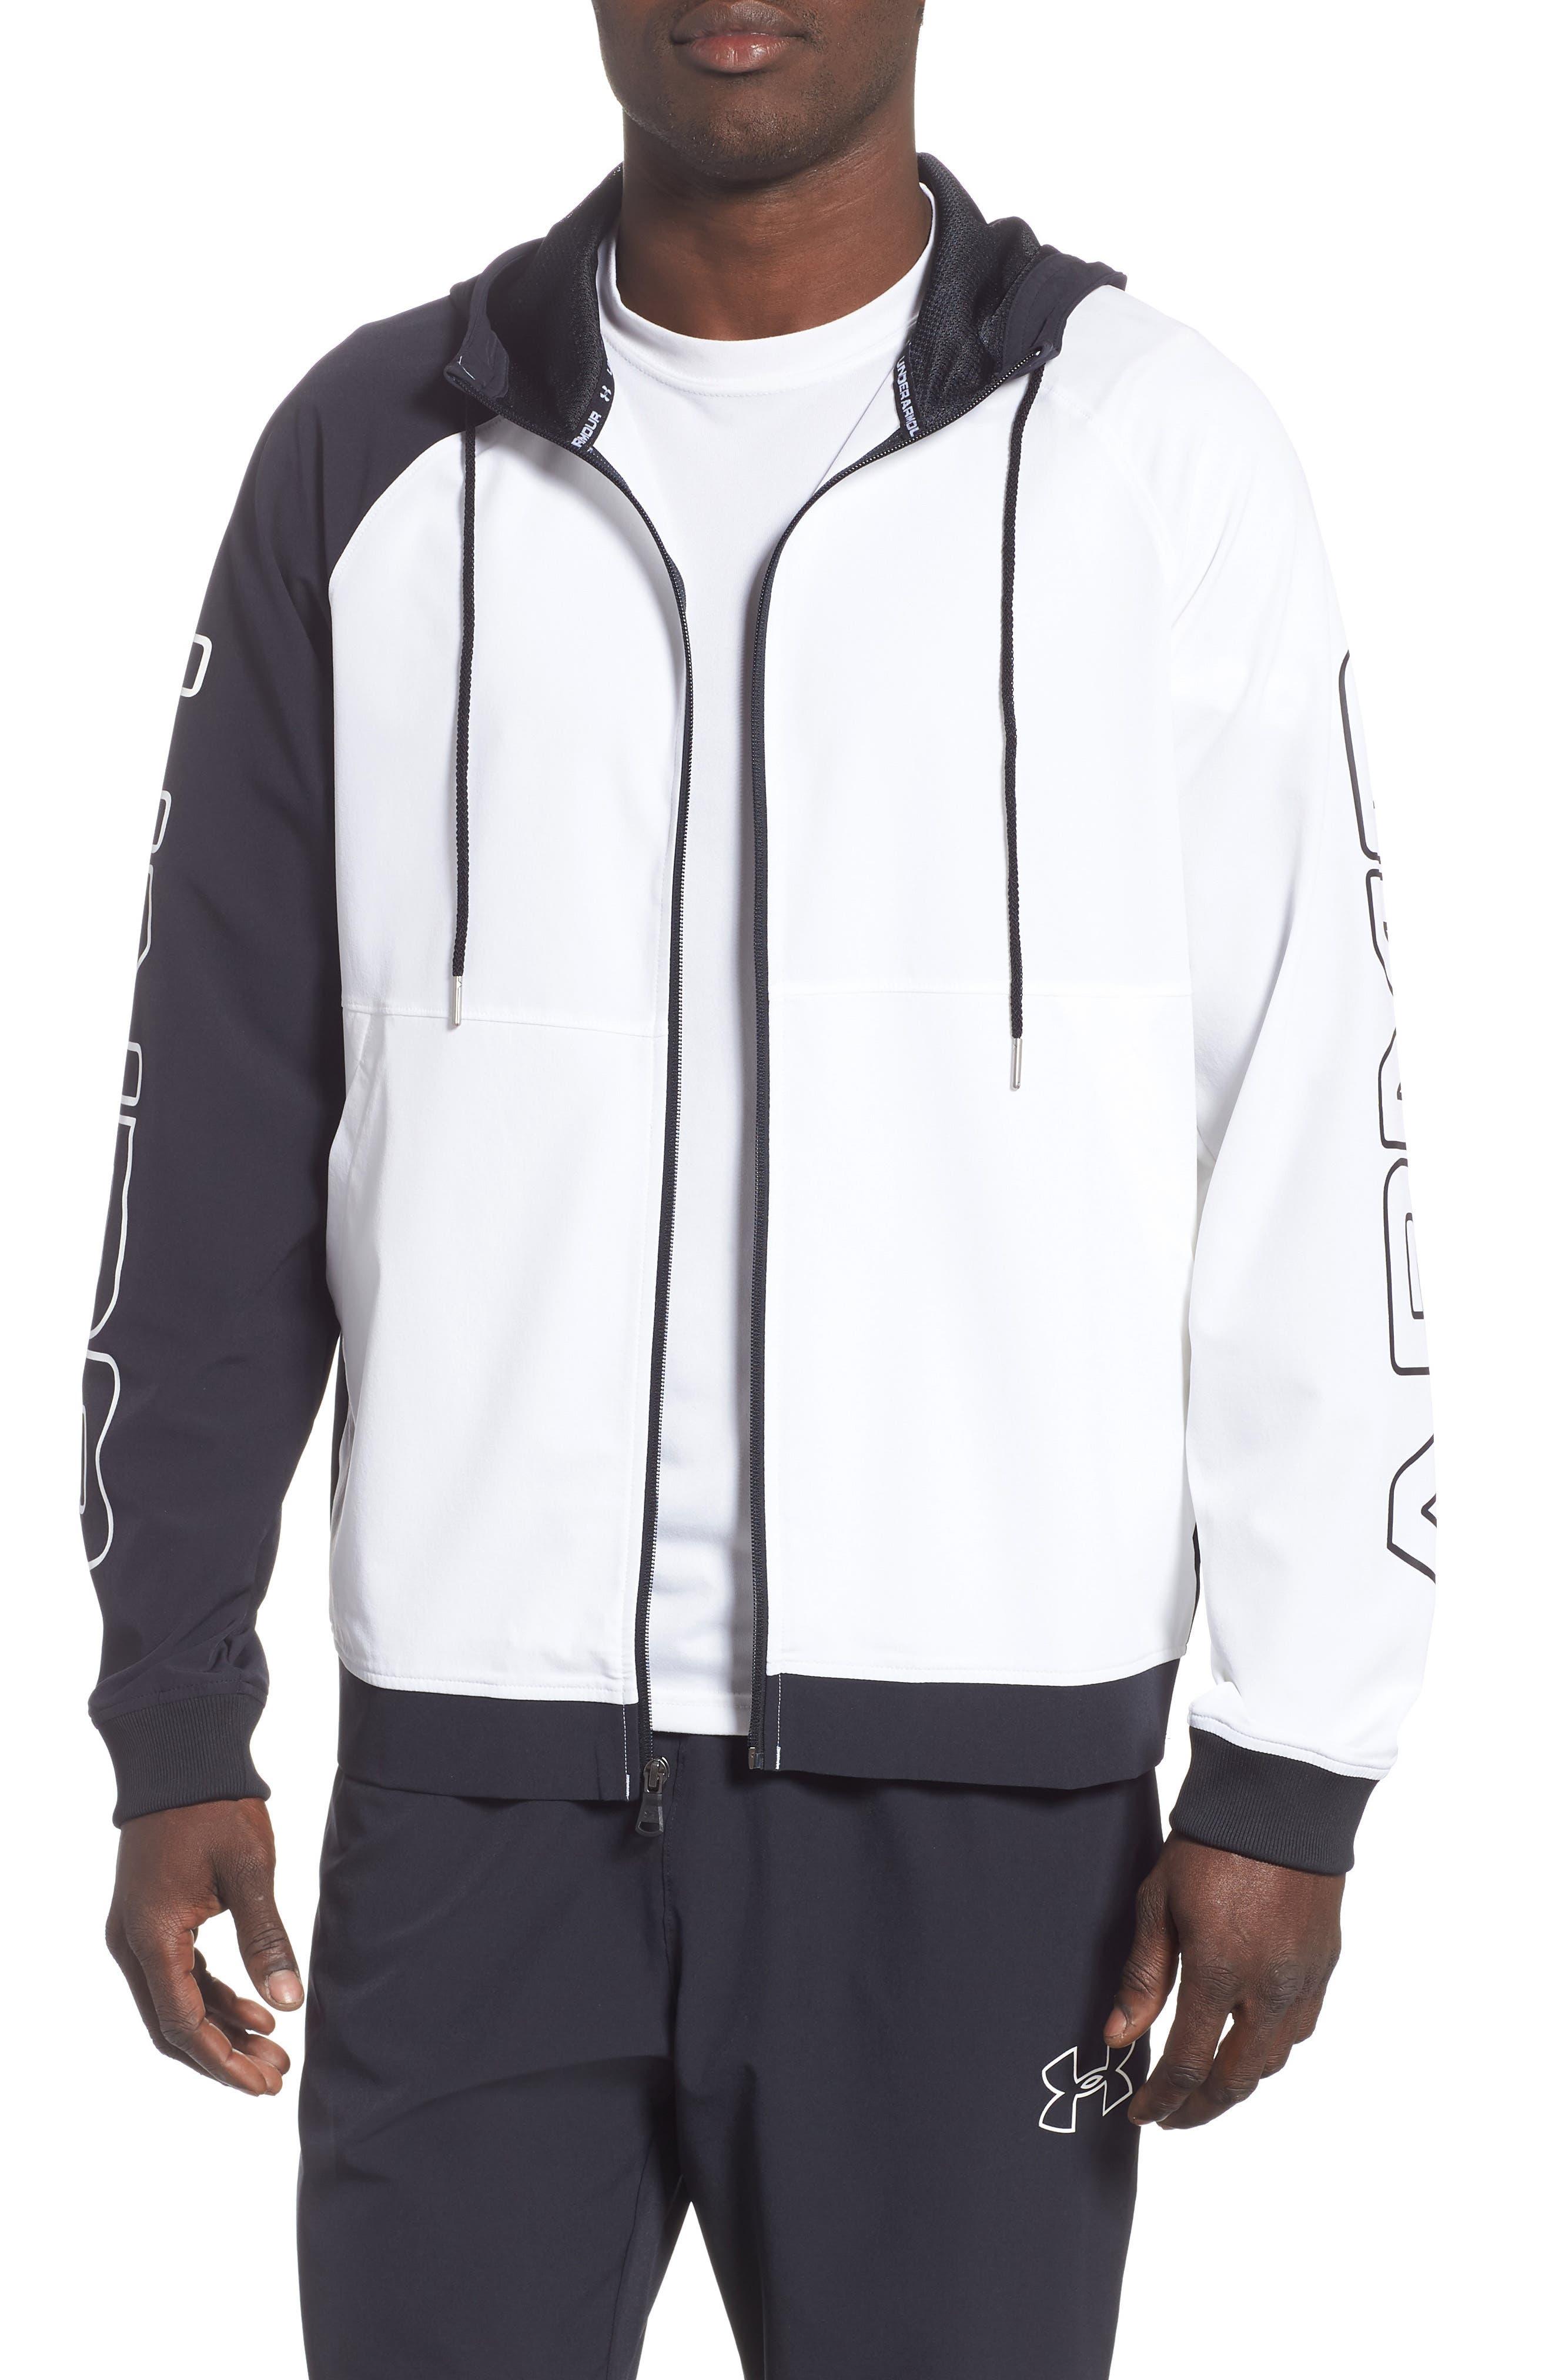 Under Armour Baseline Hooded Jacket, White